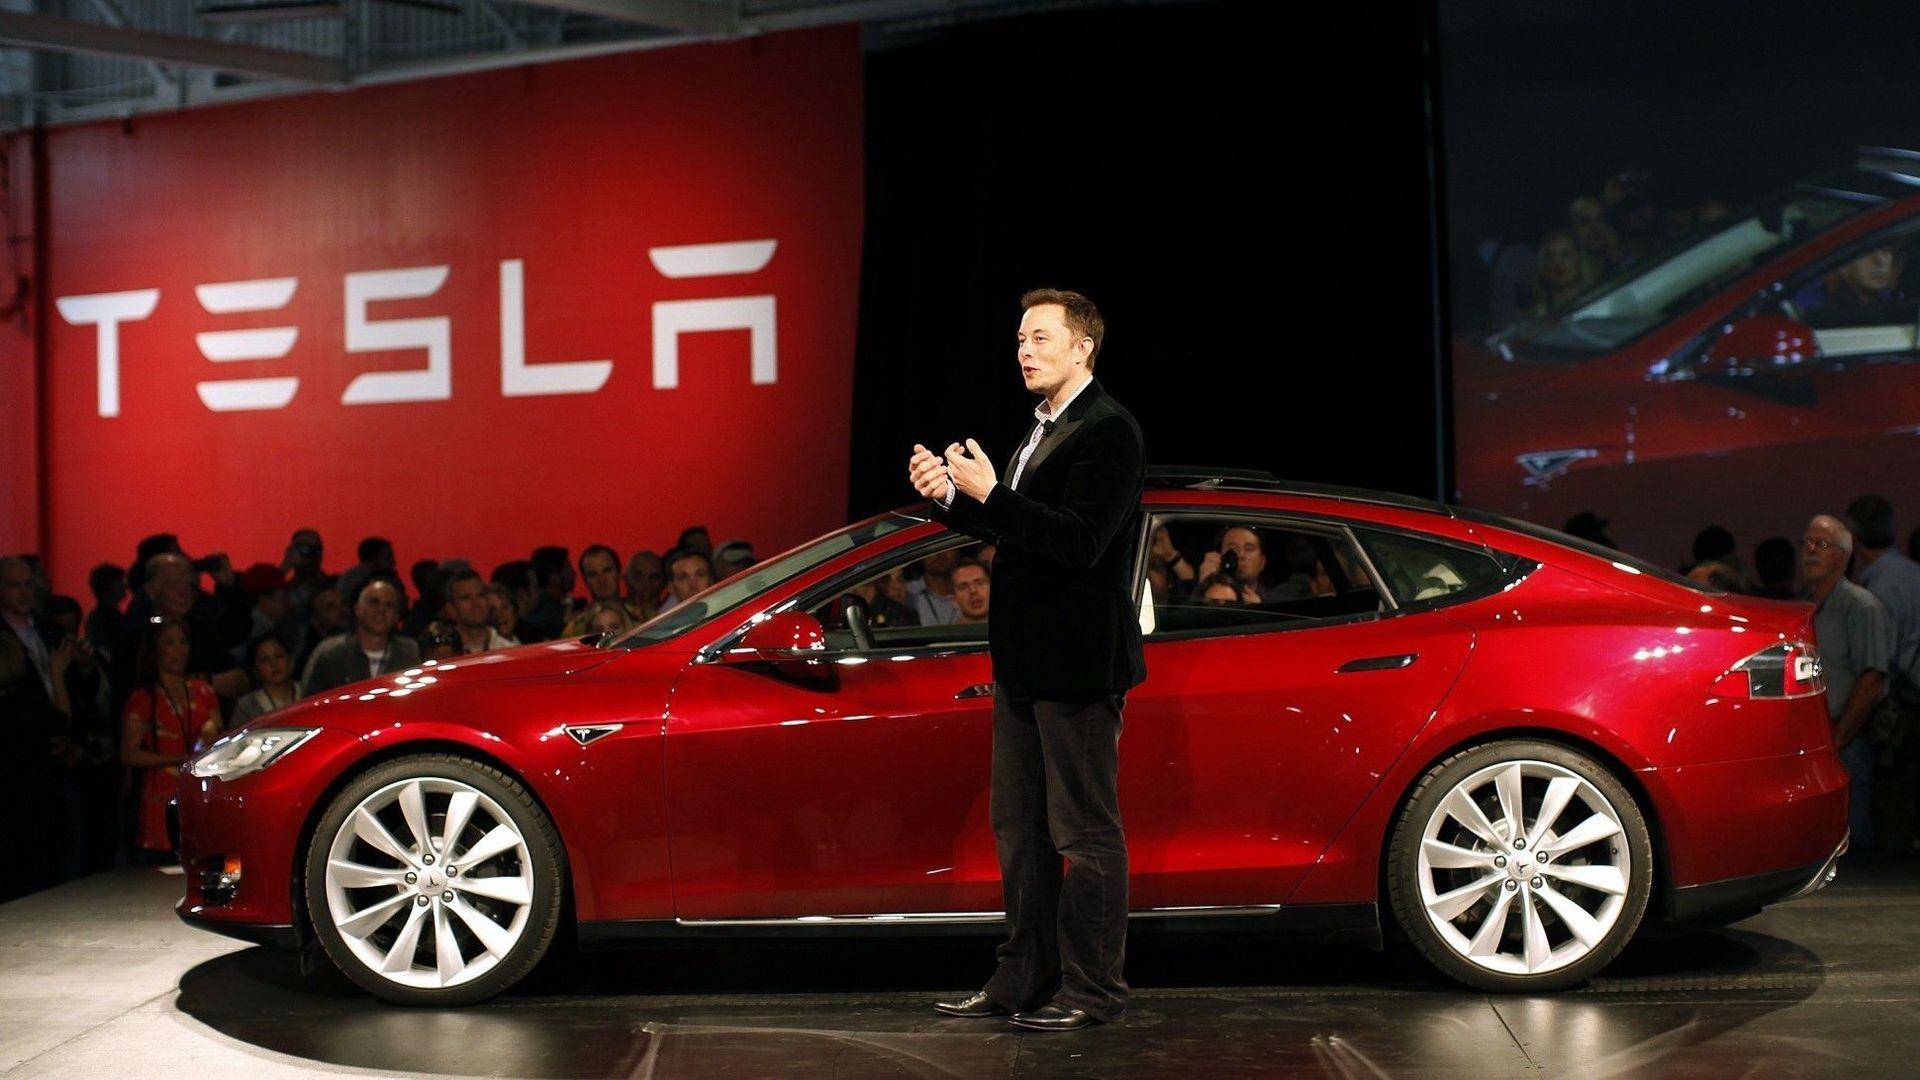 Elon Musk při prezentaci Modelu S